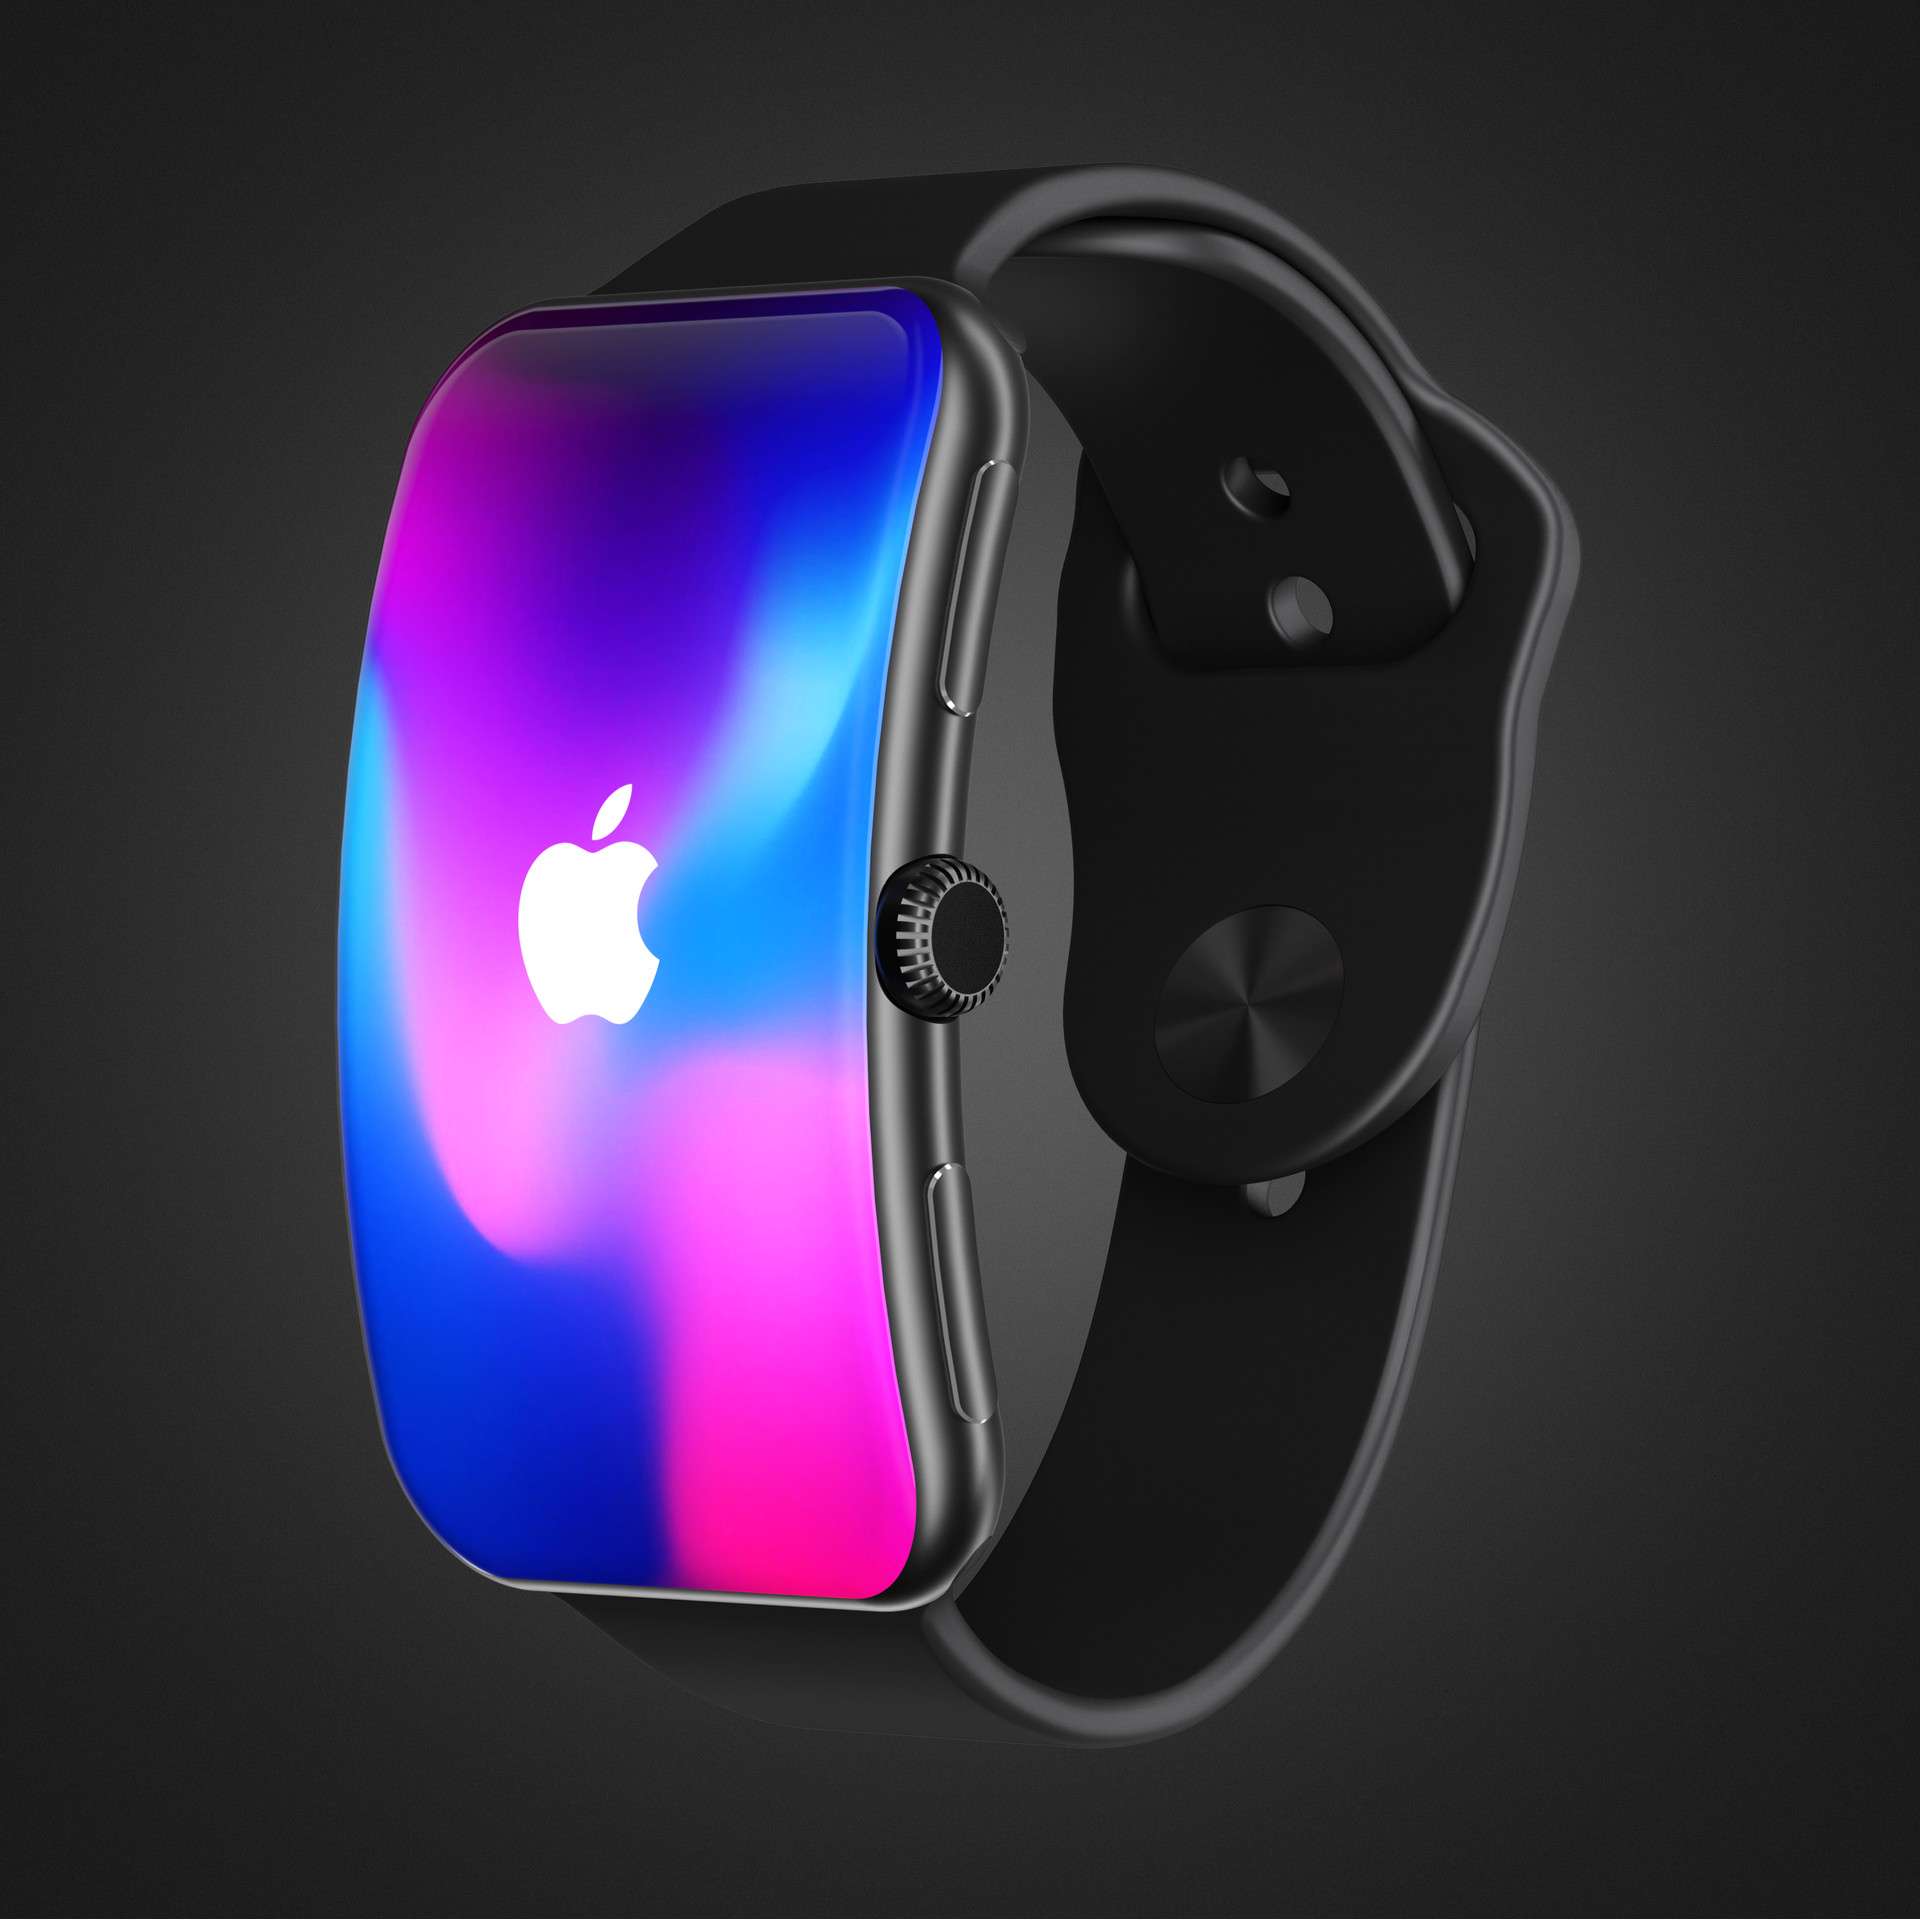 Roman Tikhonov - Apple Watch Series 4